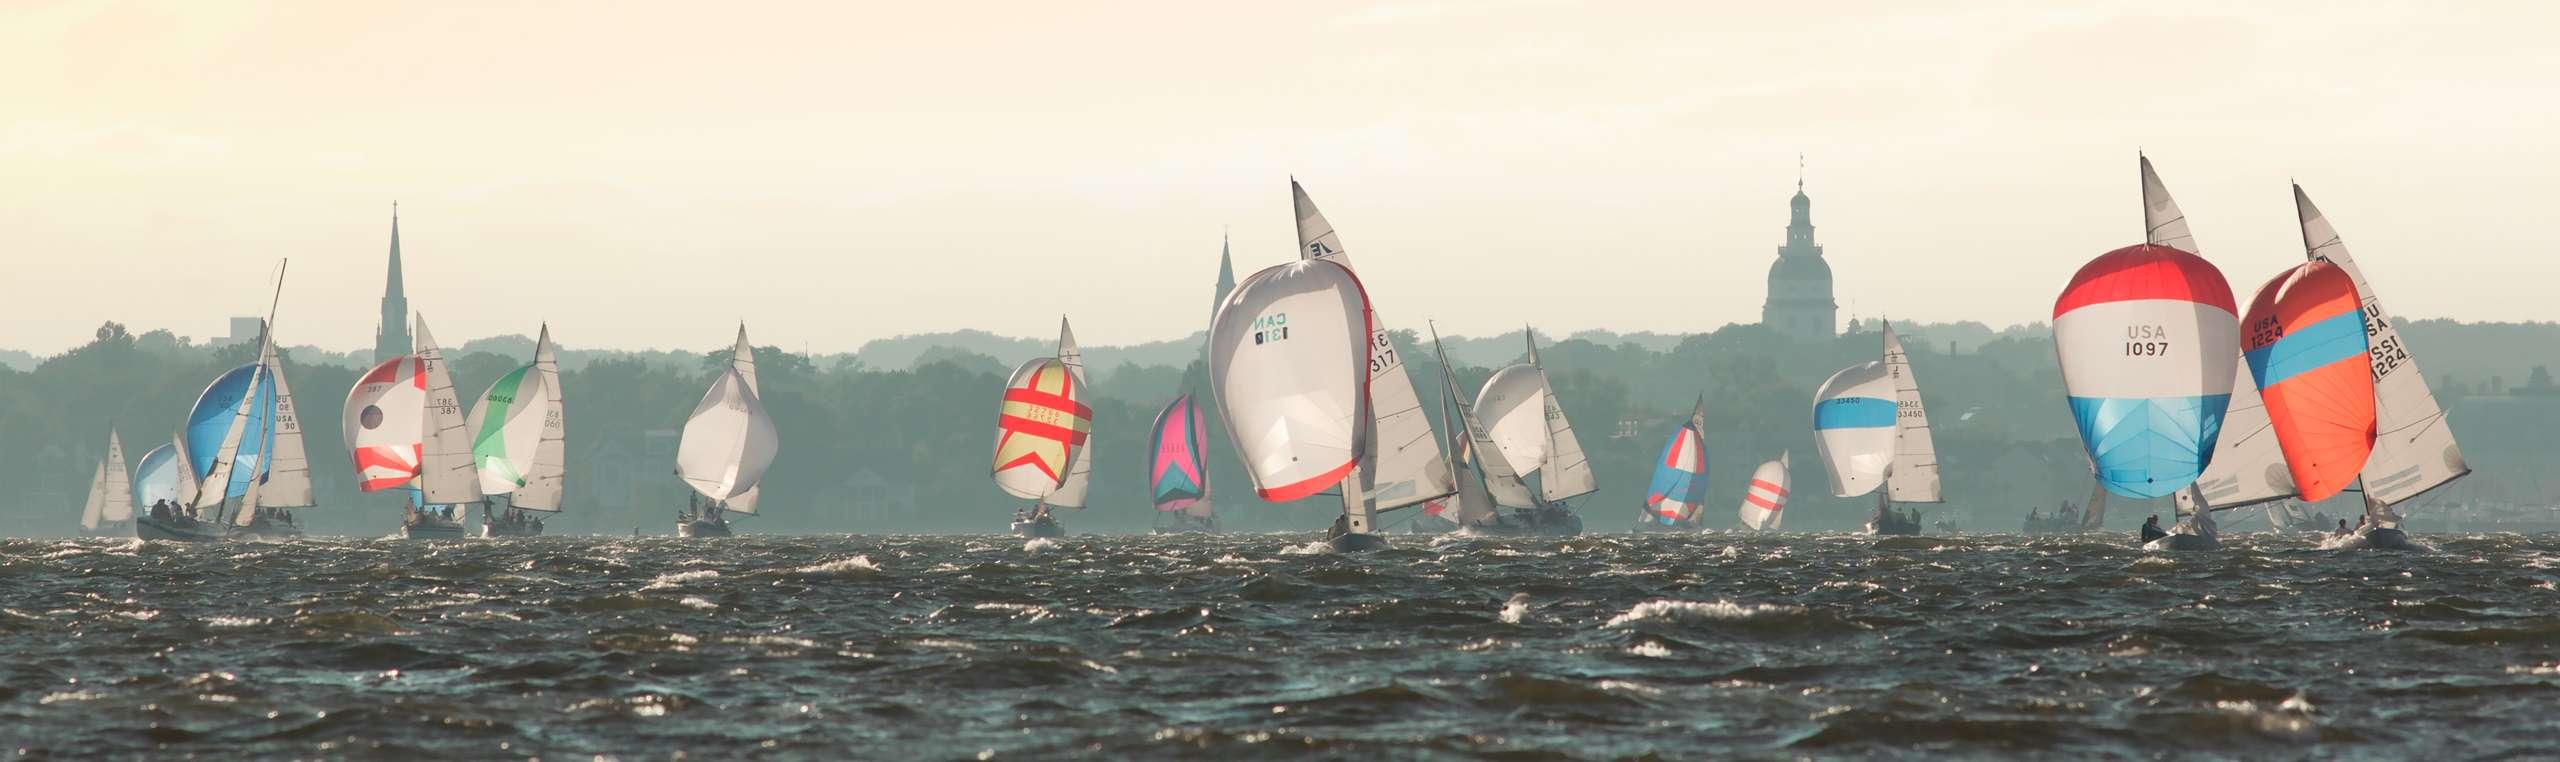 PORTFOLIO - Sailing - Chesapeake #6    PCG752